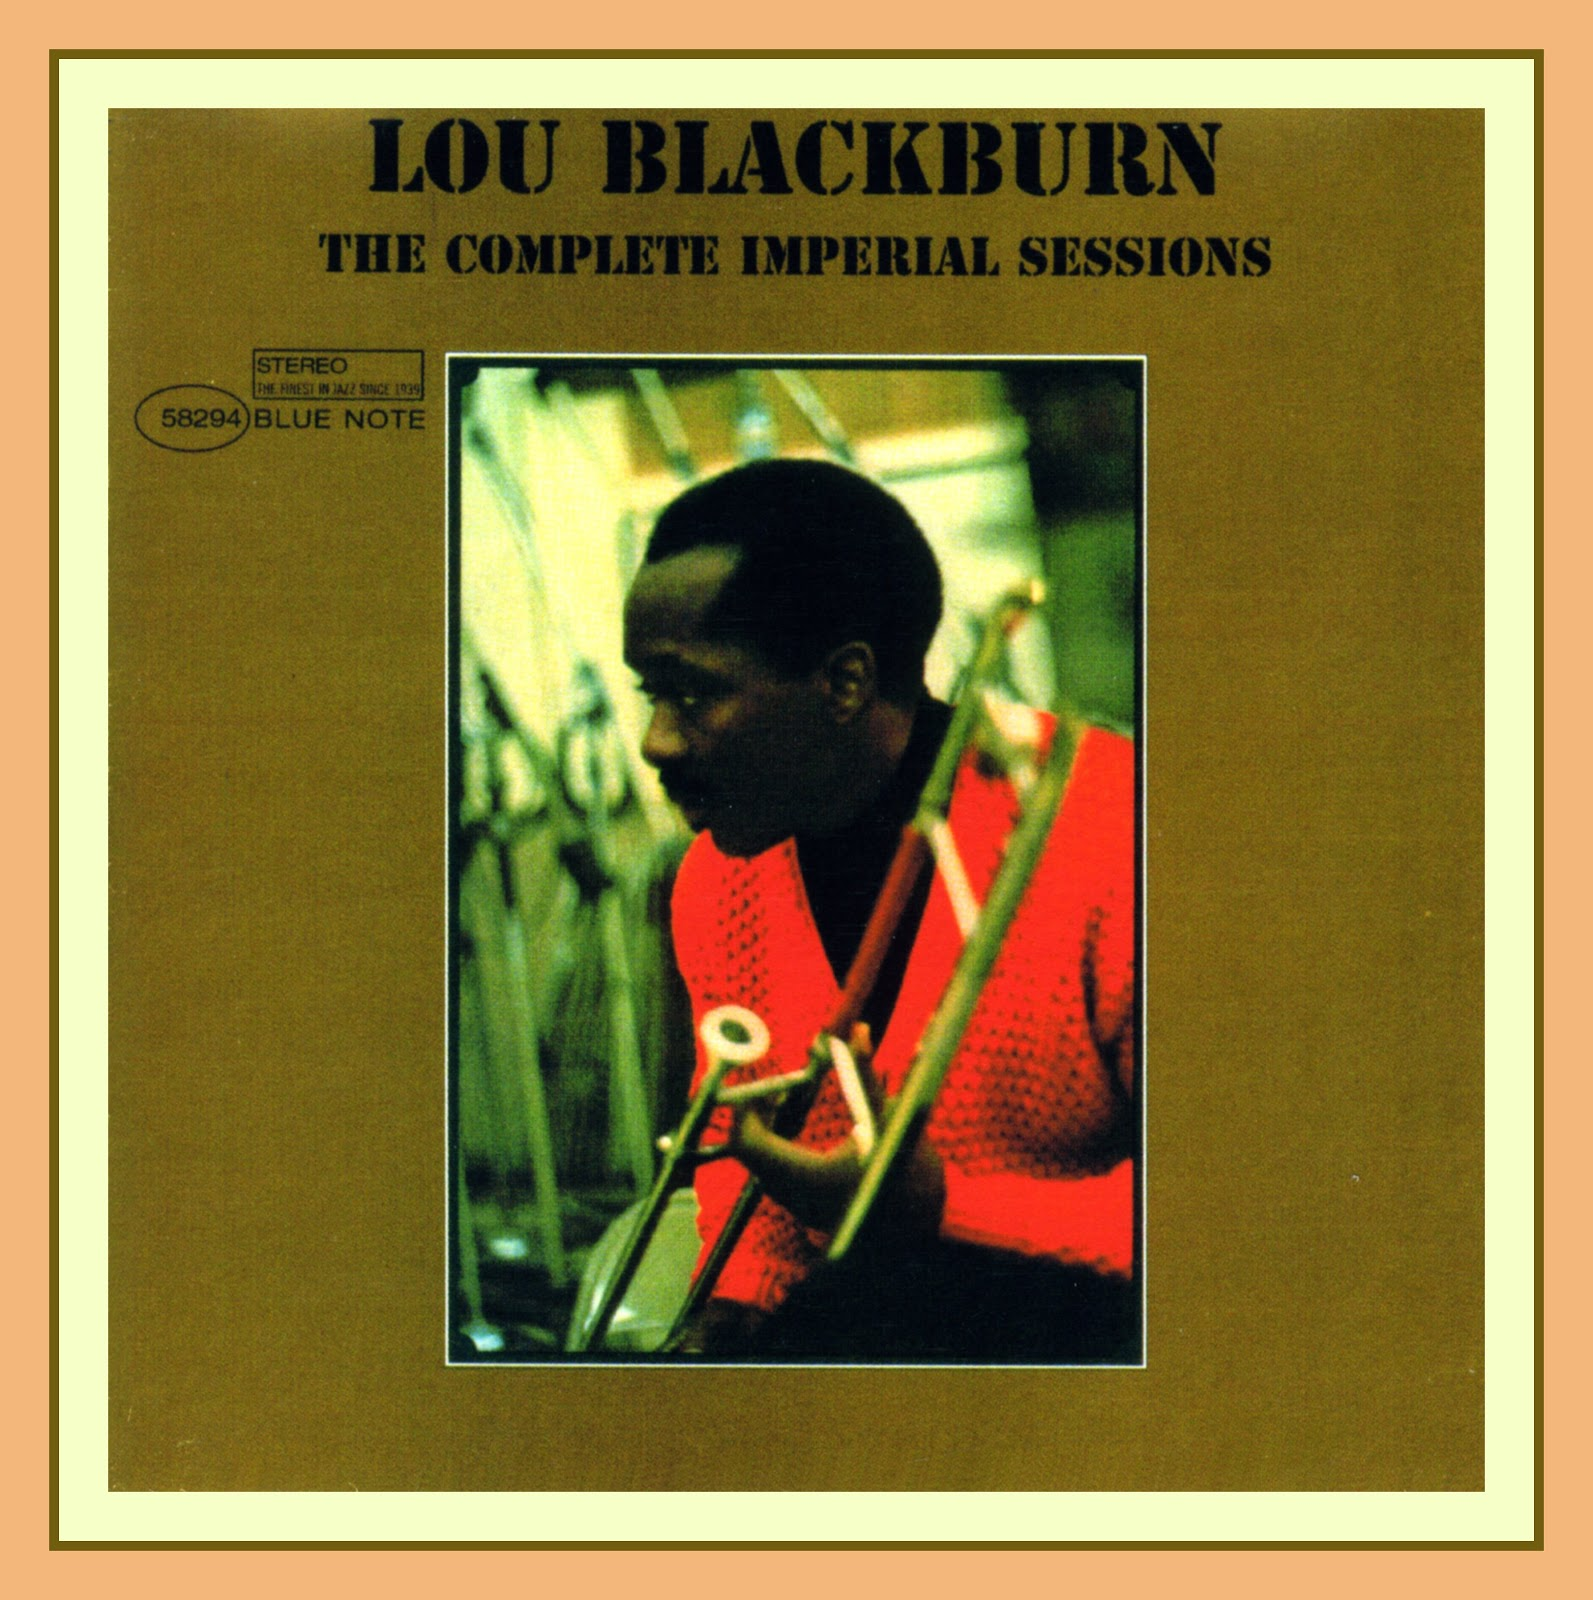 Lou Blackburn Jazz Frontier